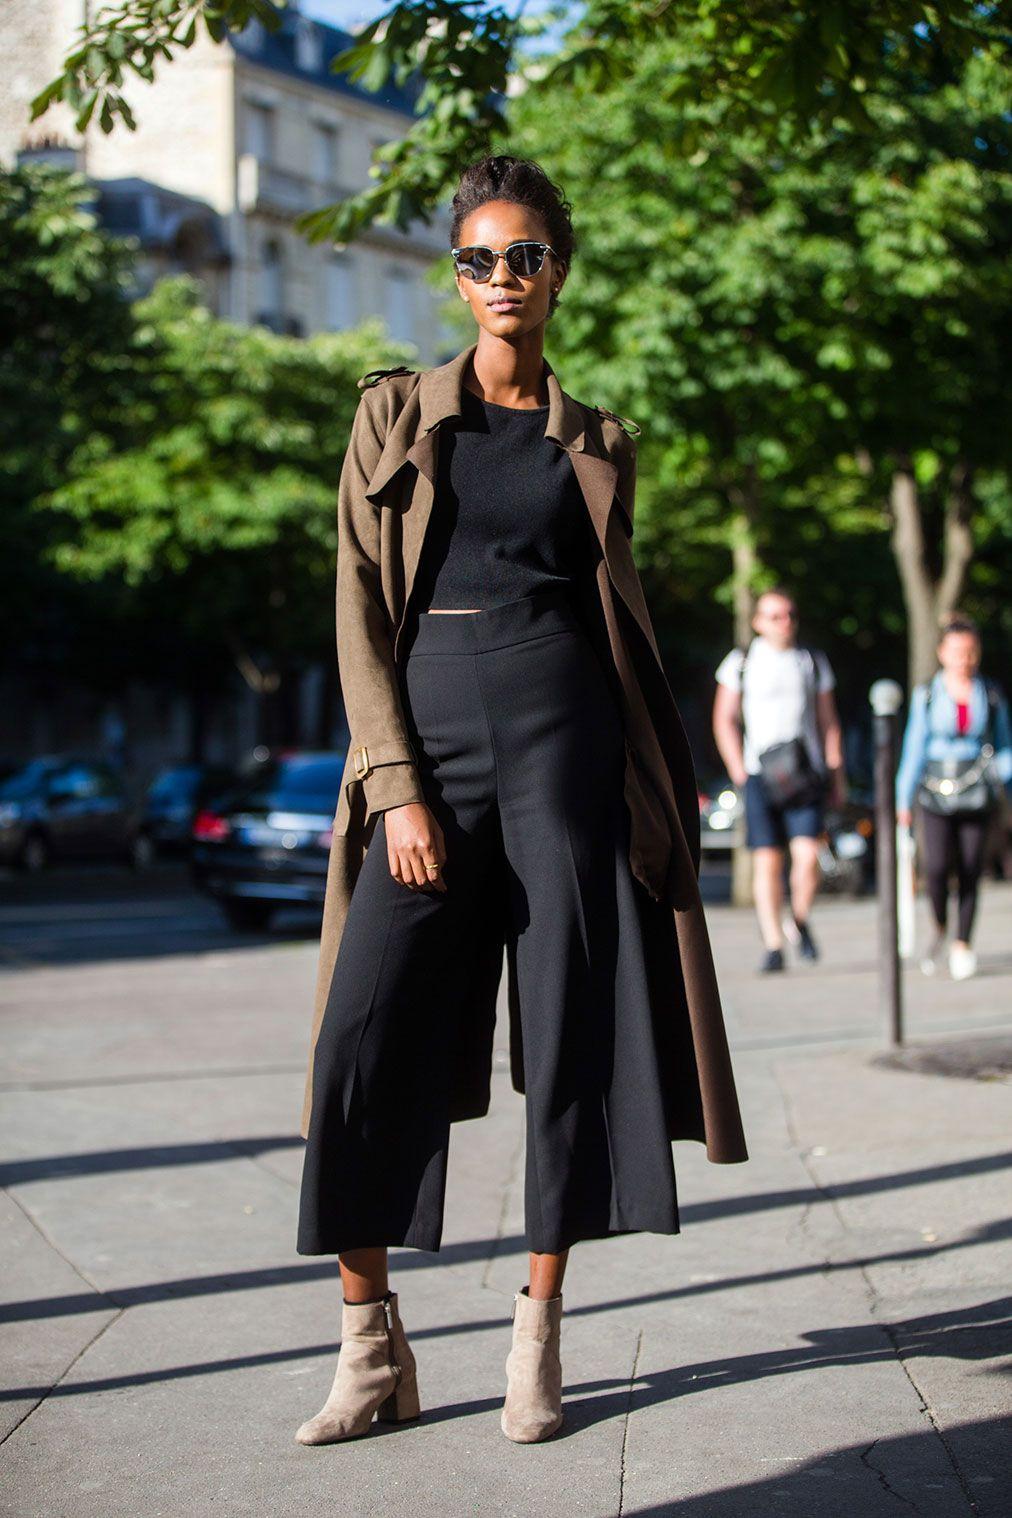 Leila Nda - On the Street: Paris Haute Couture Week Fall 16 - July 2016